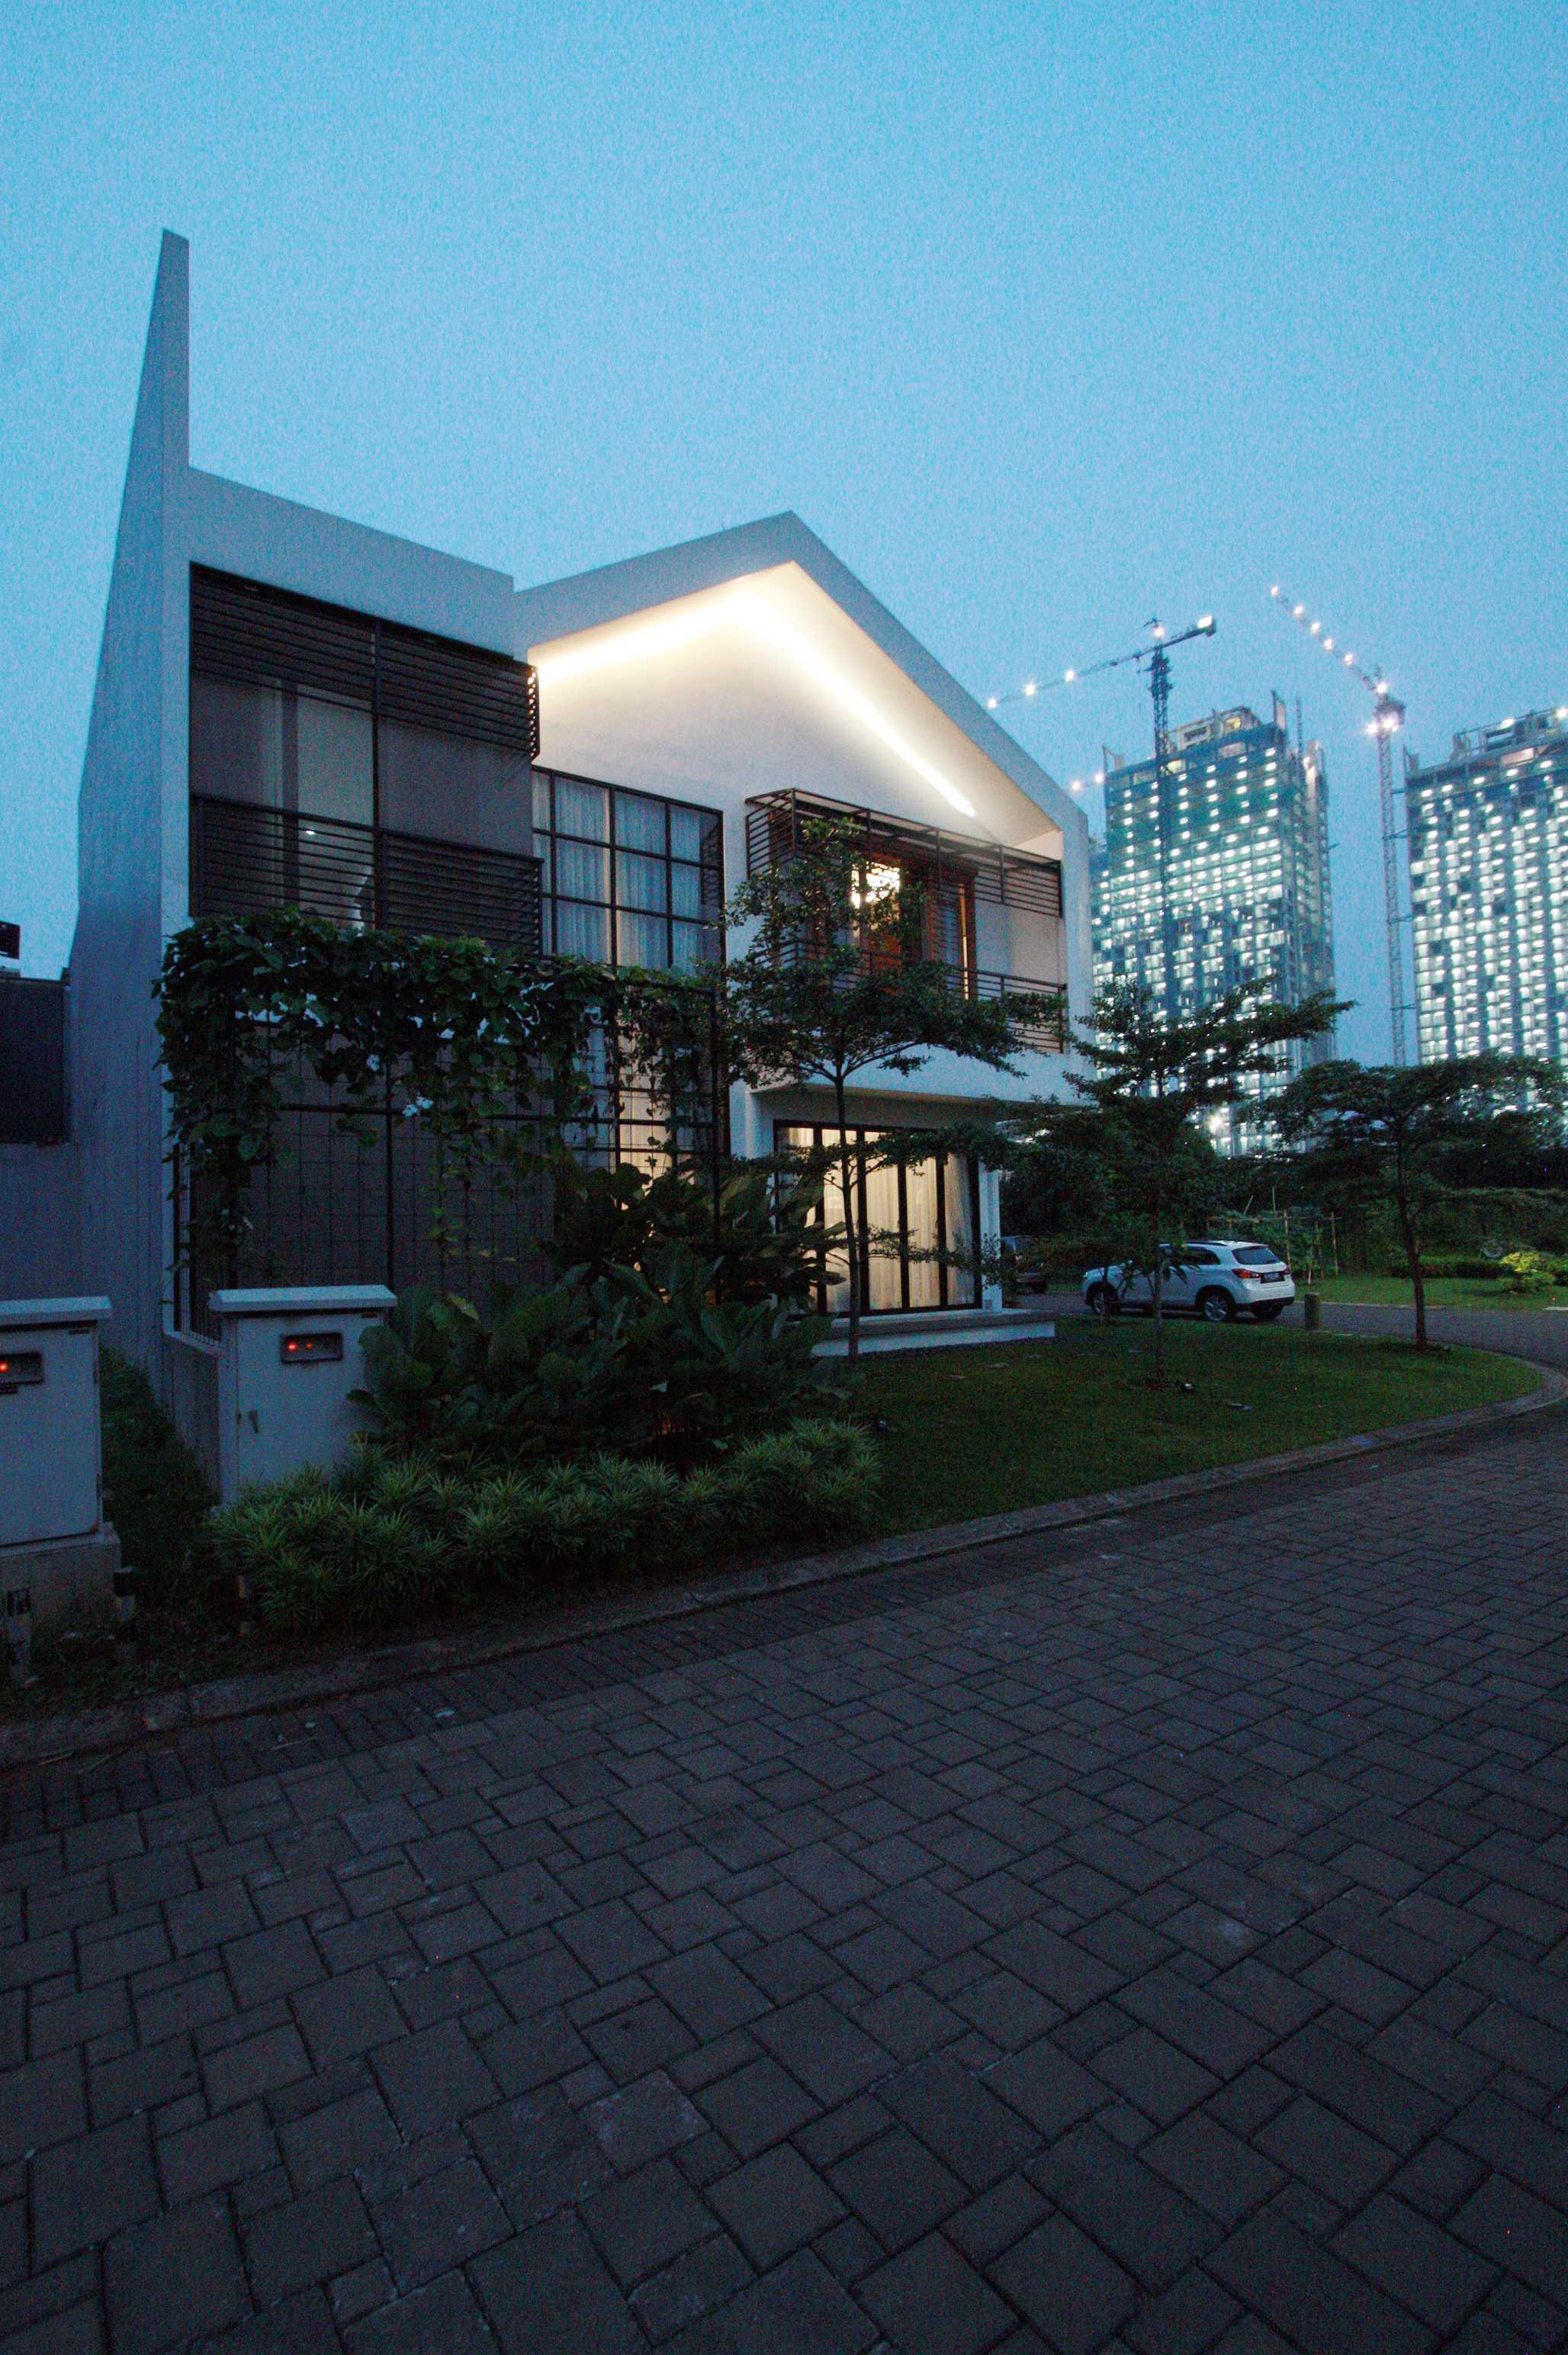 Ddap Architect Foresta Fiore House Bsd Tangerang Bsd Tangerang E1   44380